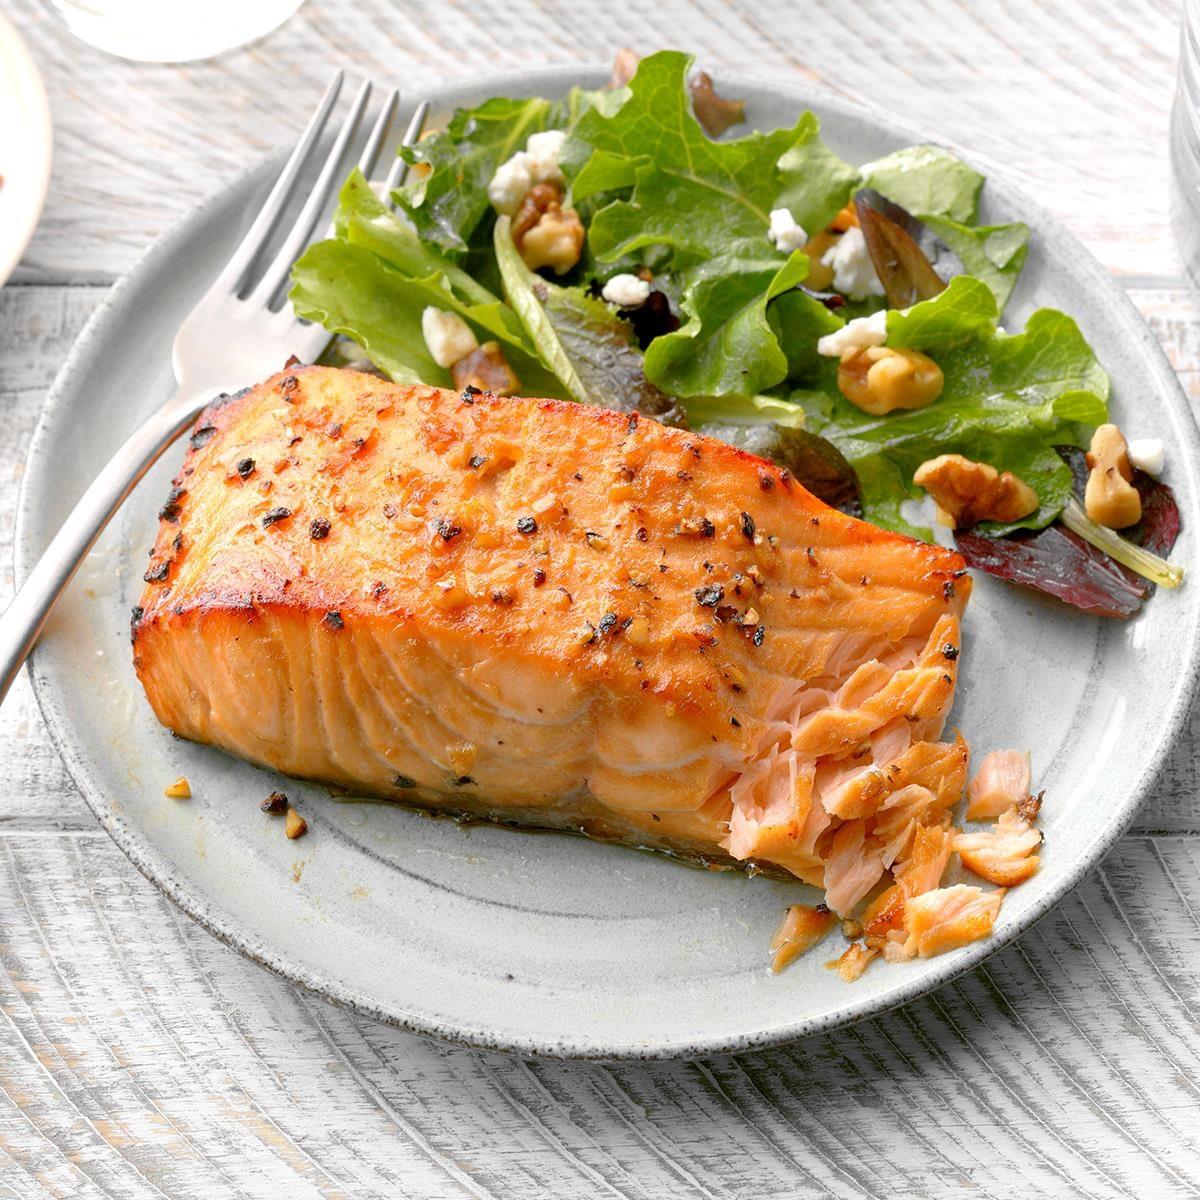 Flavorful salmon